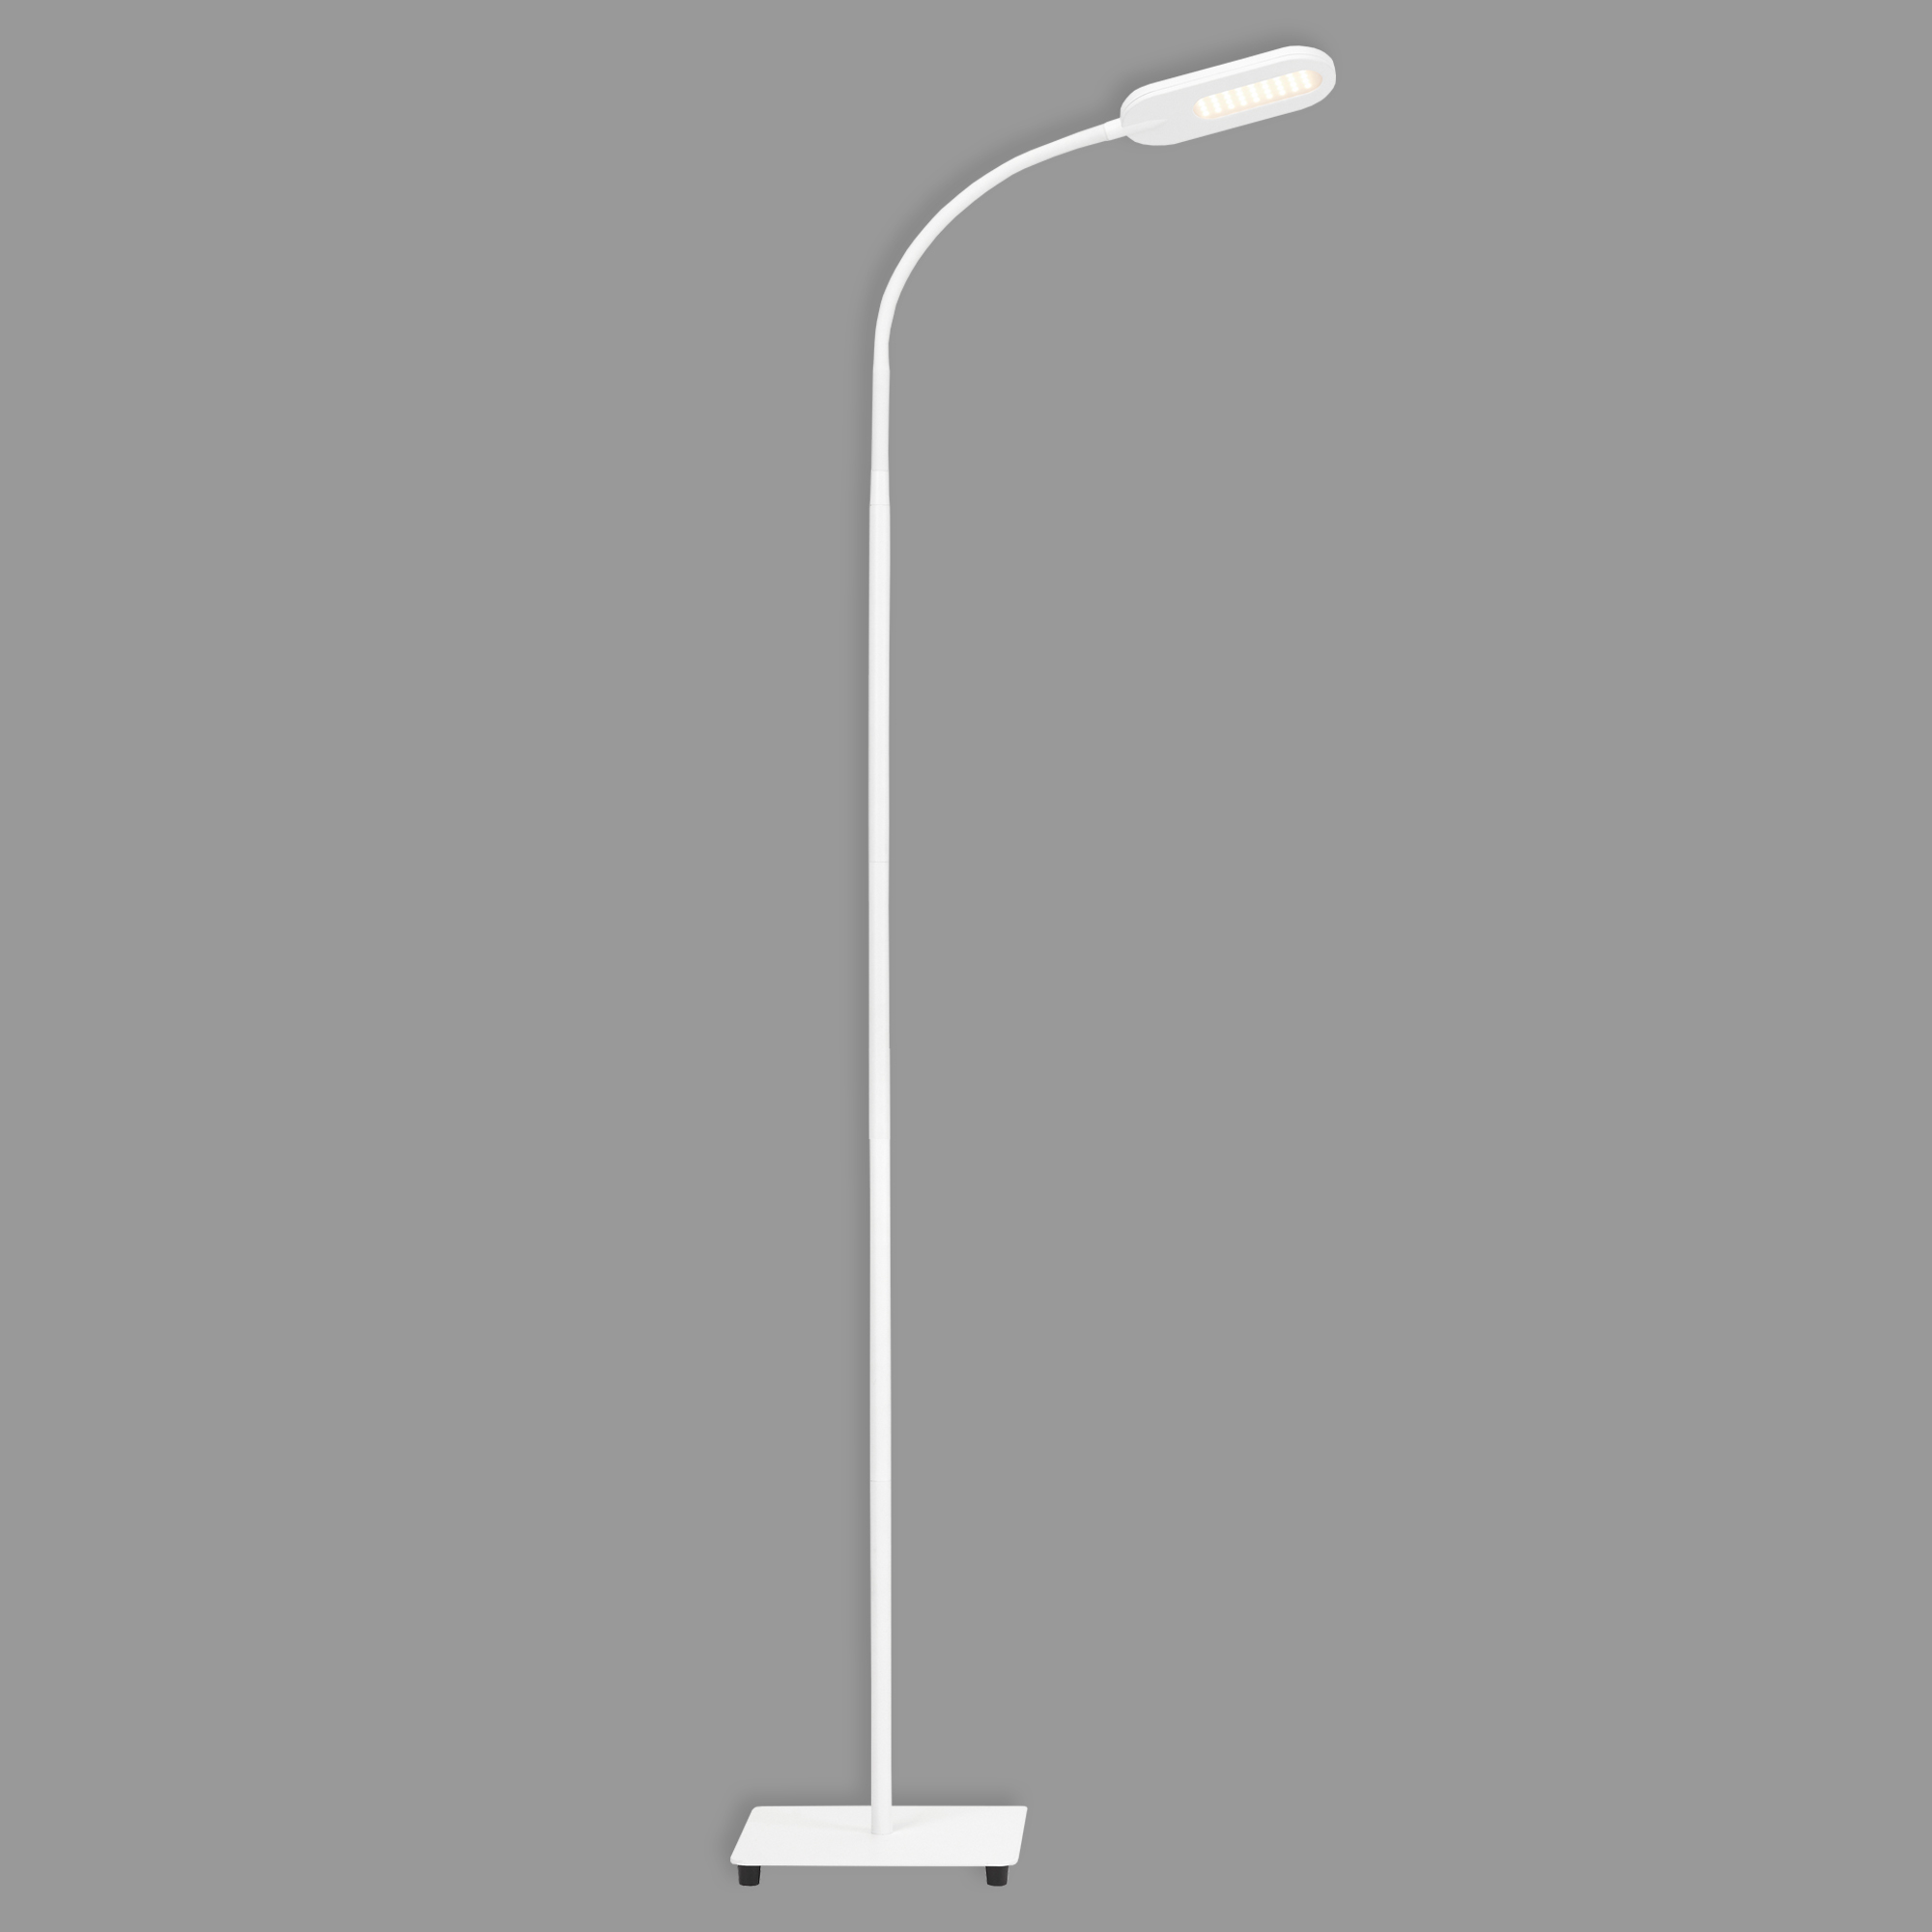 CCT LED Stehleuchte, 158,6 cm, 8 W, Weiss